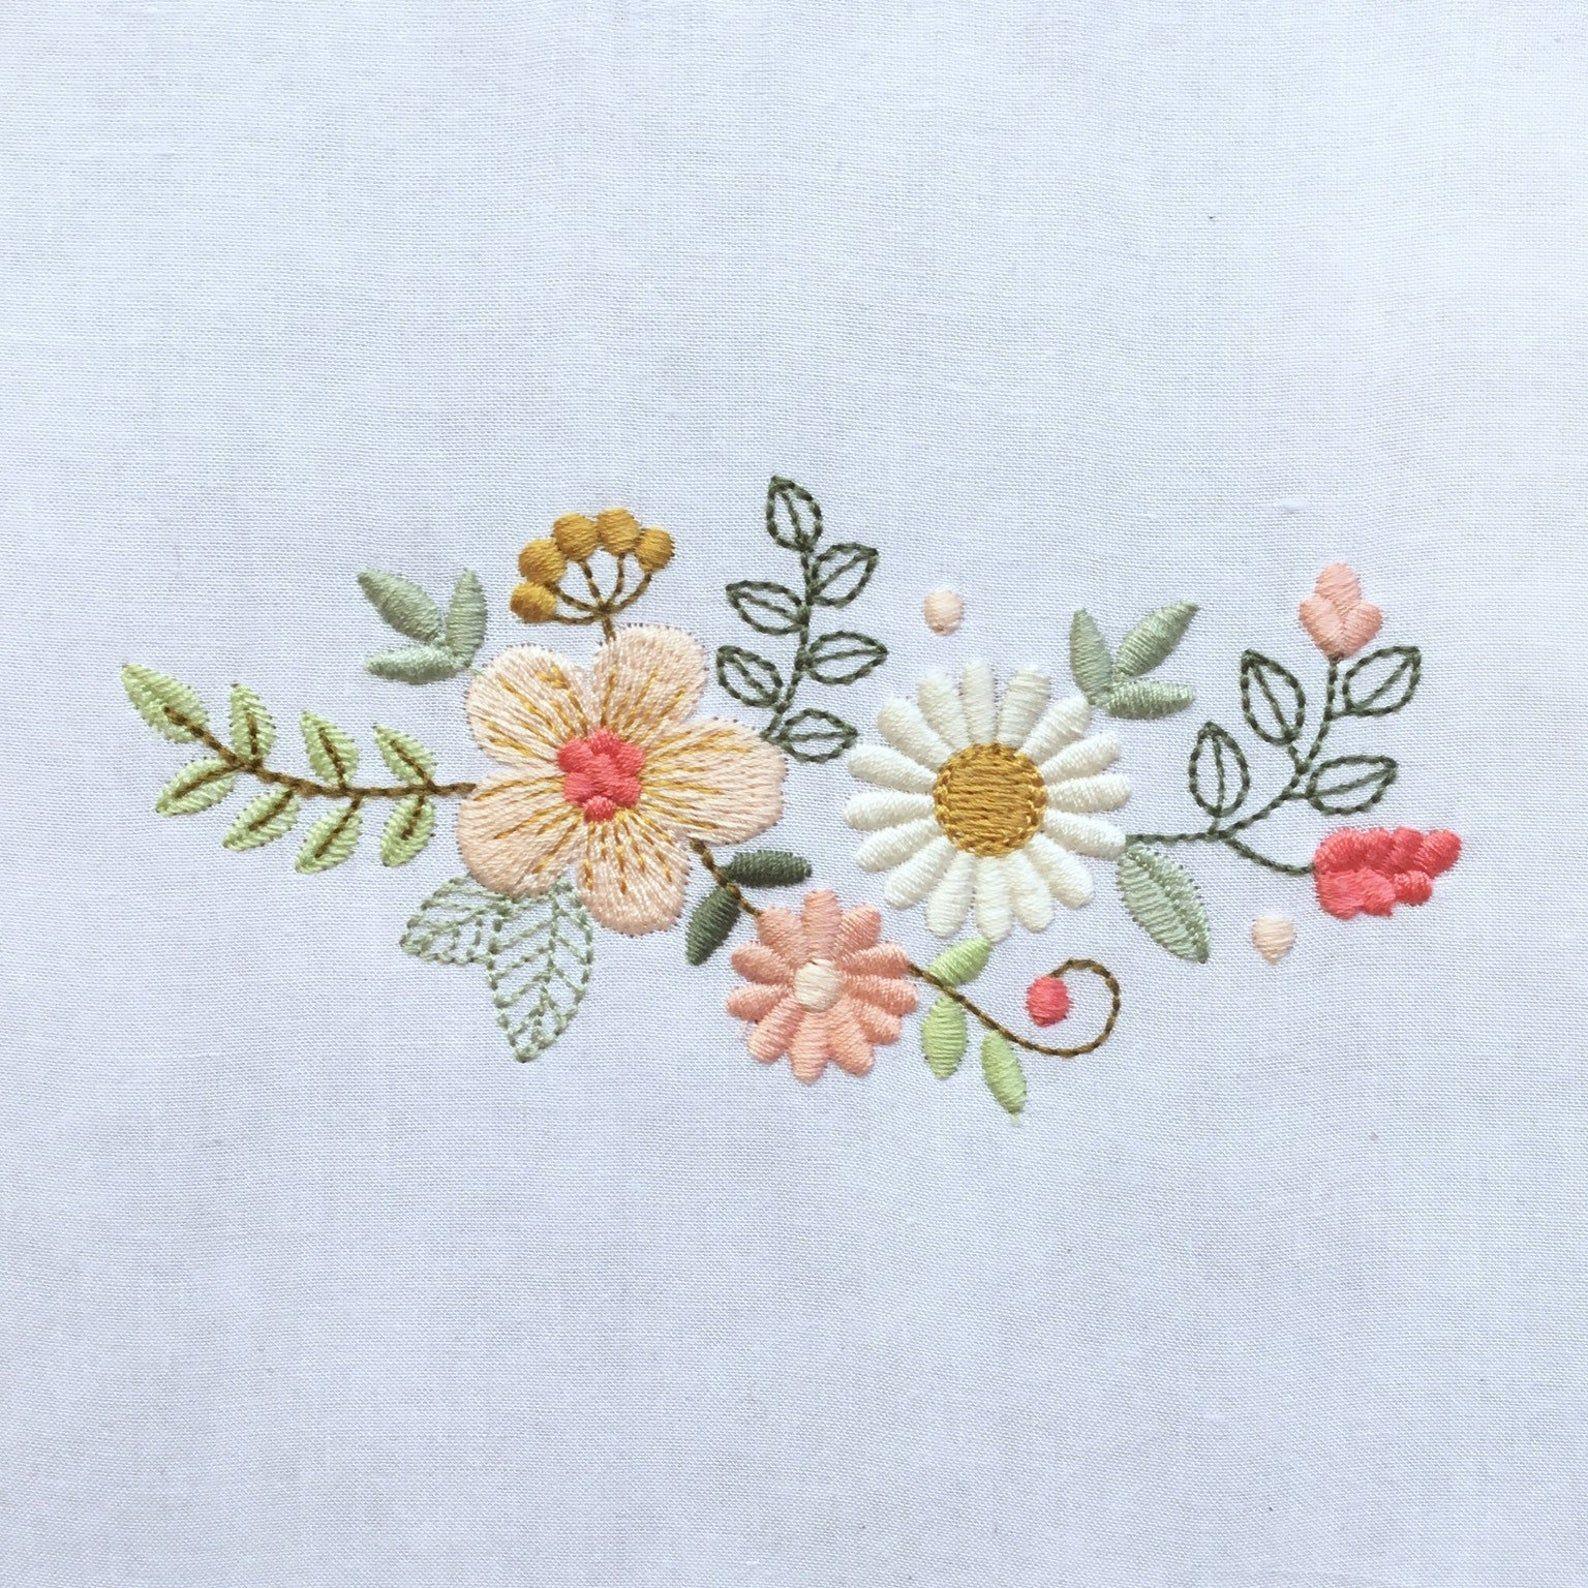 Diseño de flores para bordado a máquina – Flores de estilo moderno. Matriz de bordado digital a 9 colores . 3 tamaños. Descarga inmediata